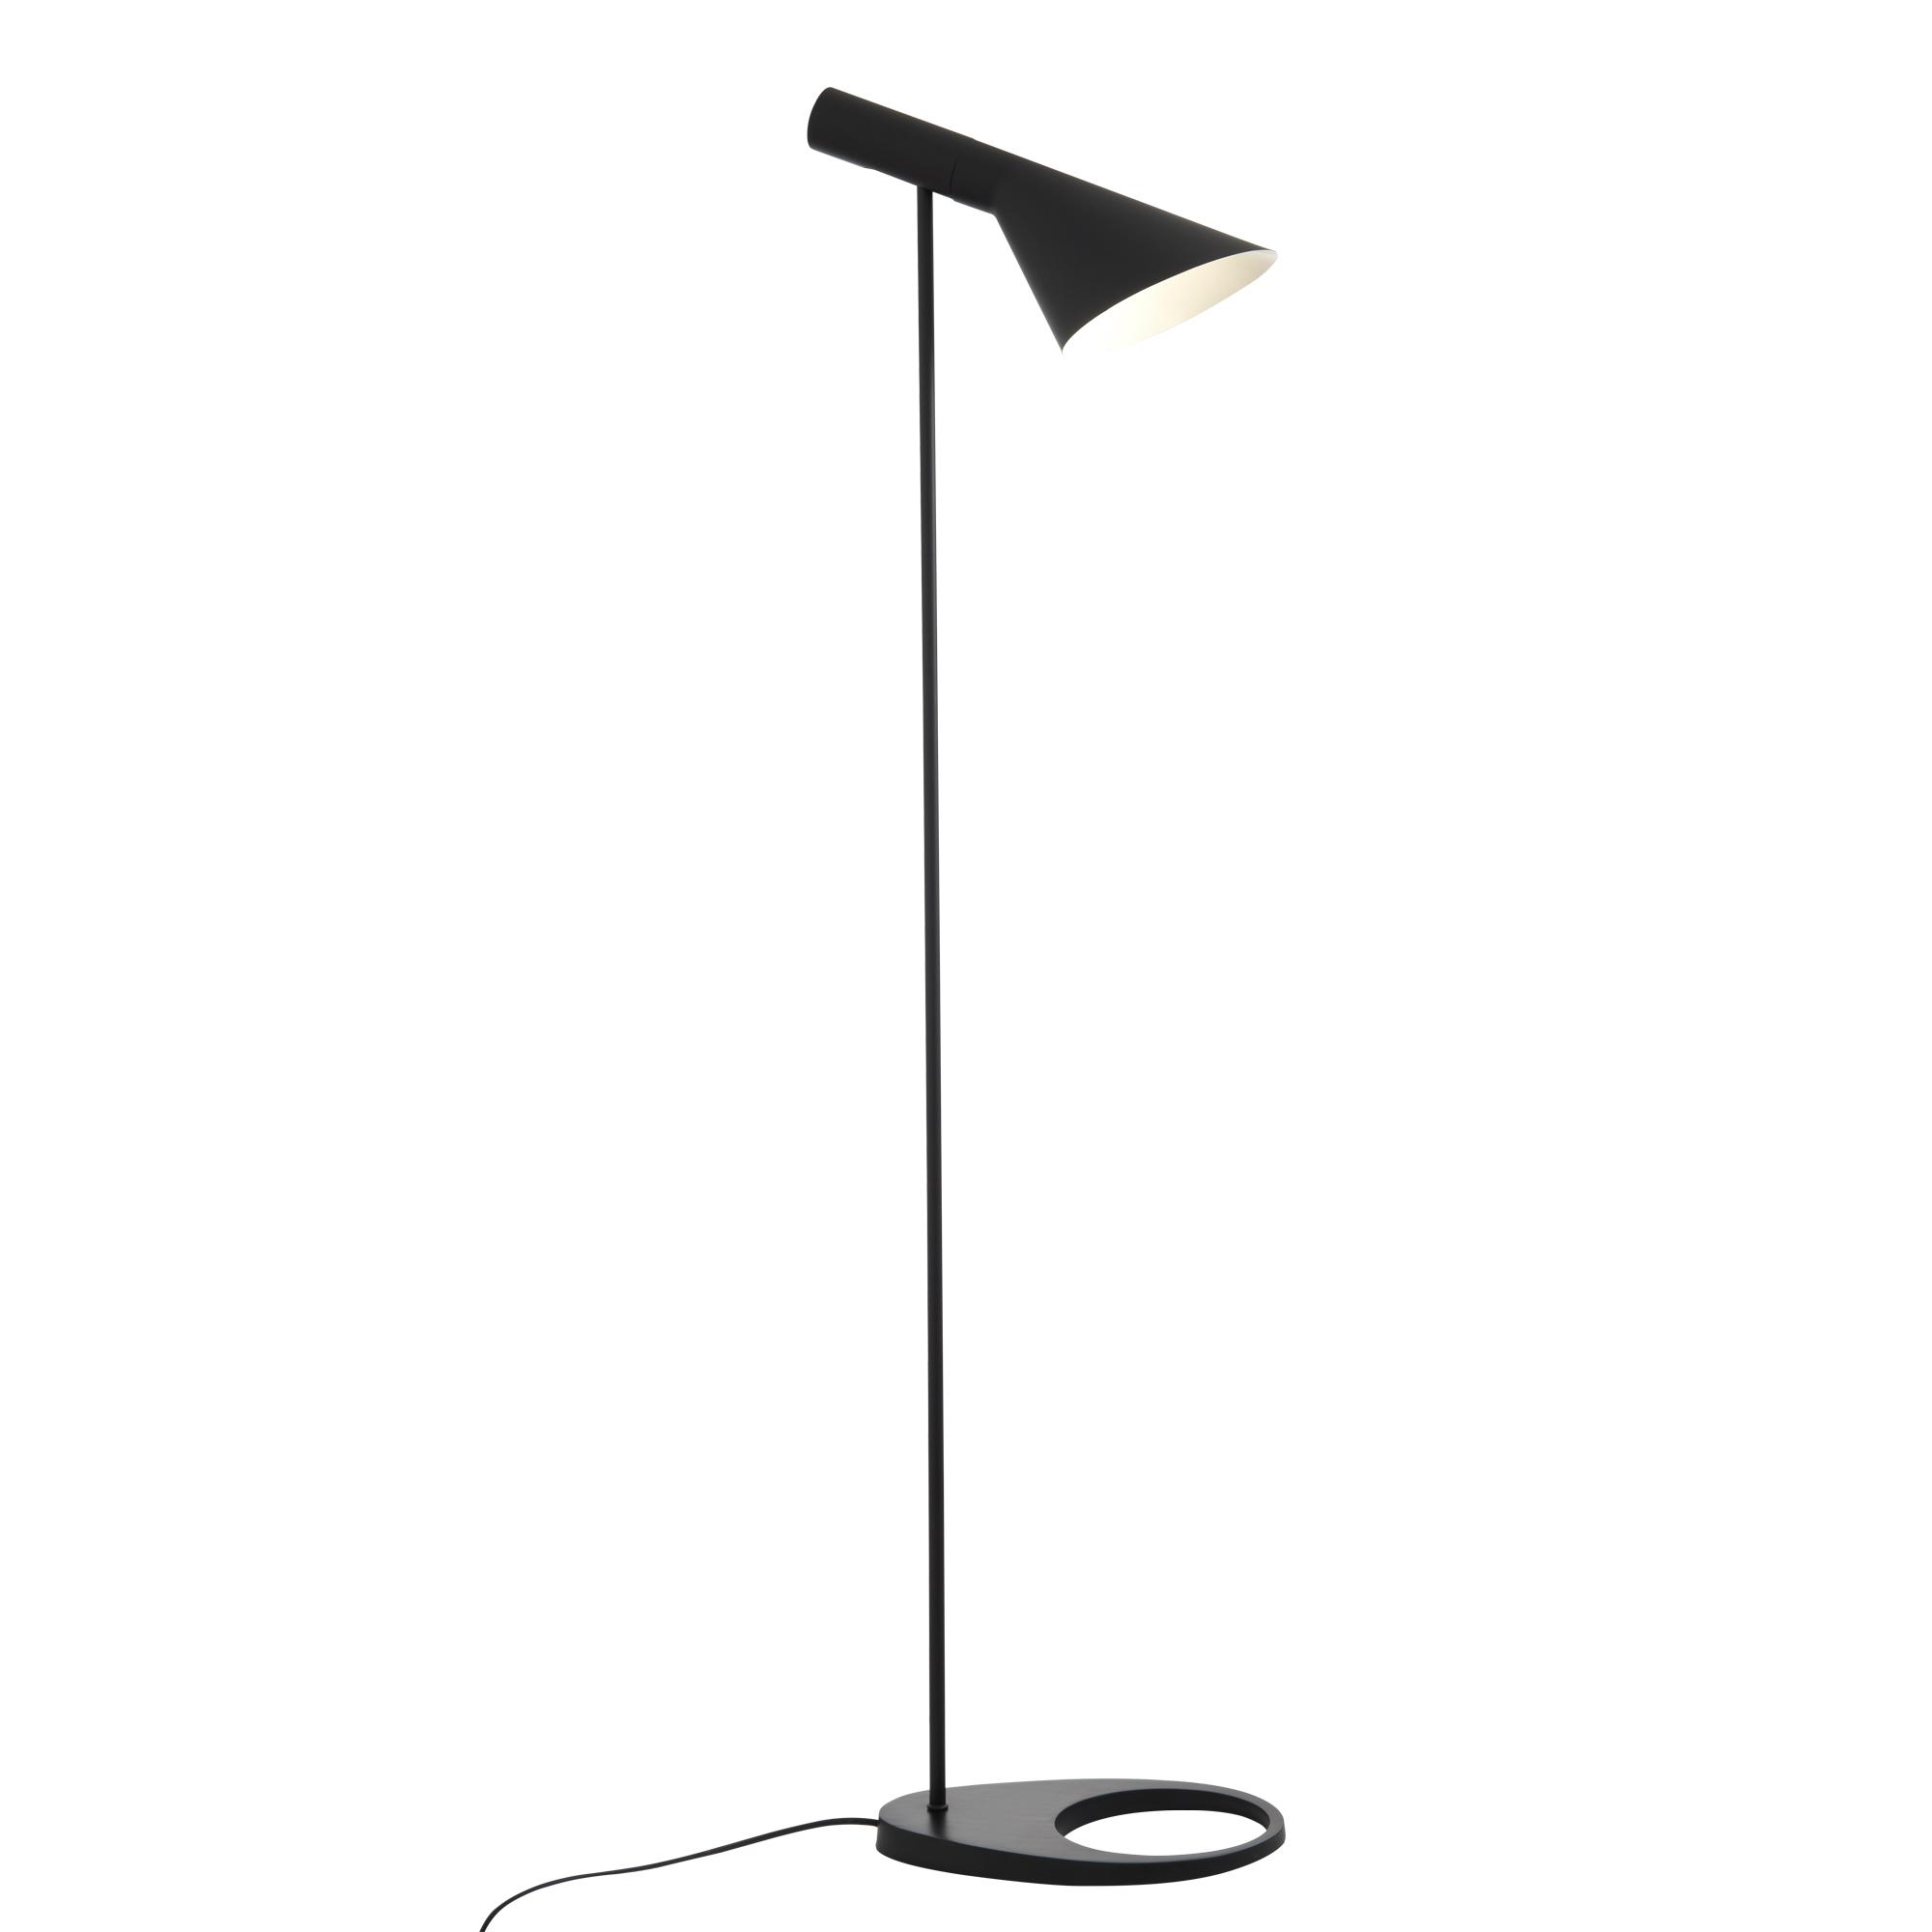 Напольный светильник MODEMODERN MD.8021.01FL BK